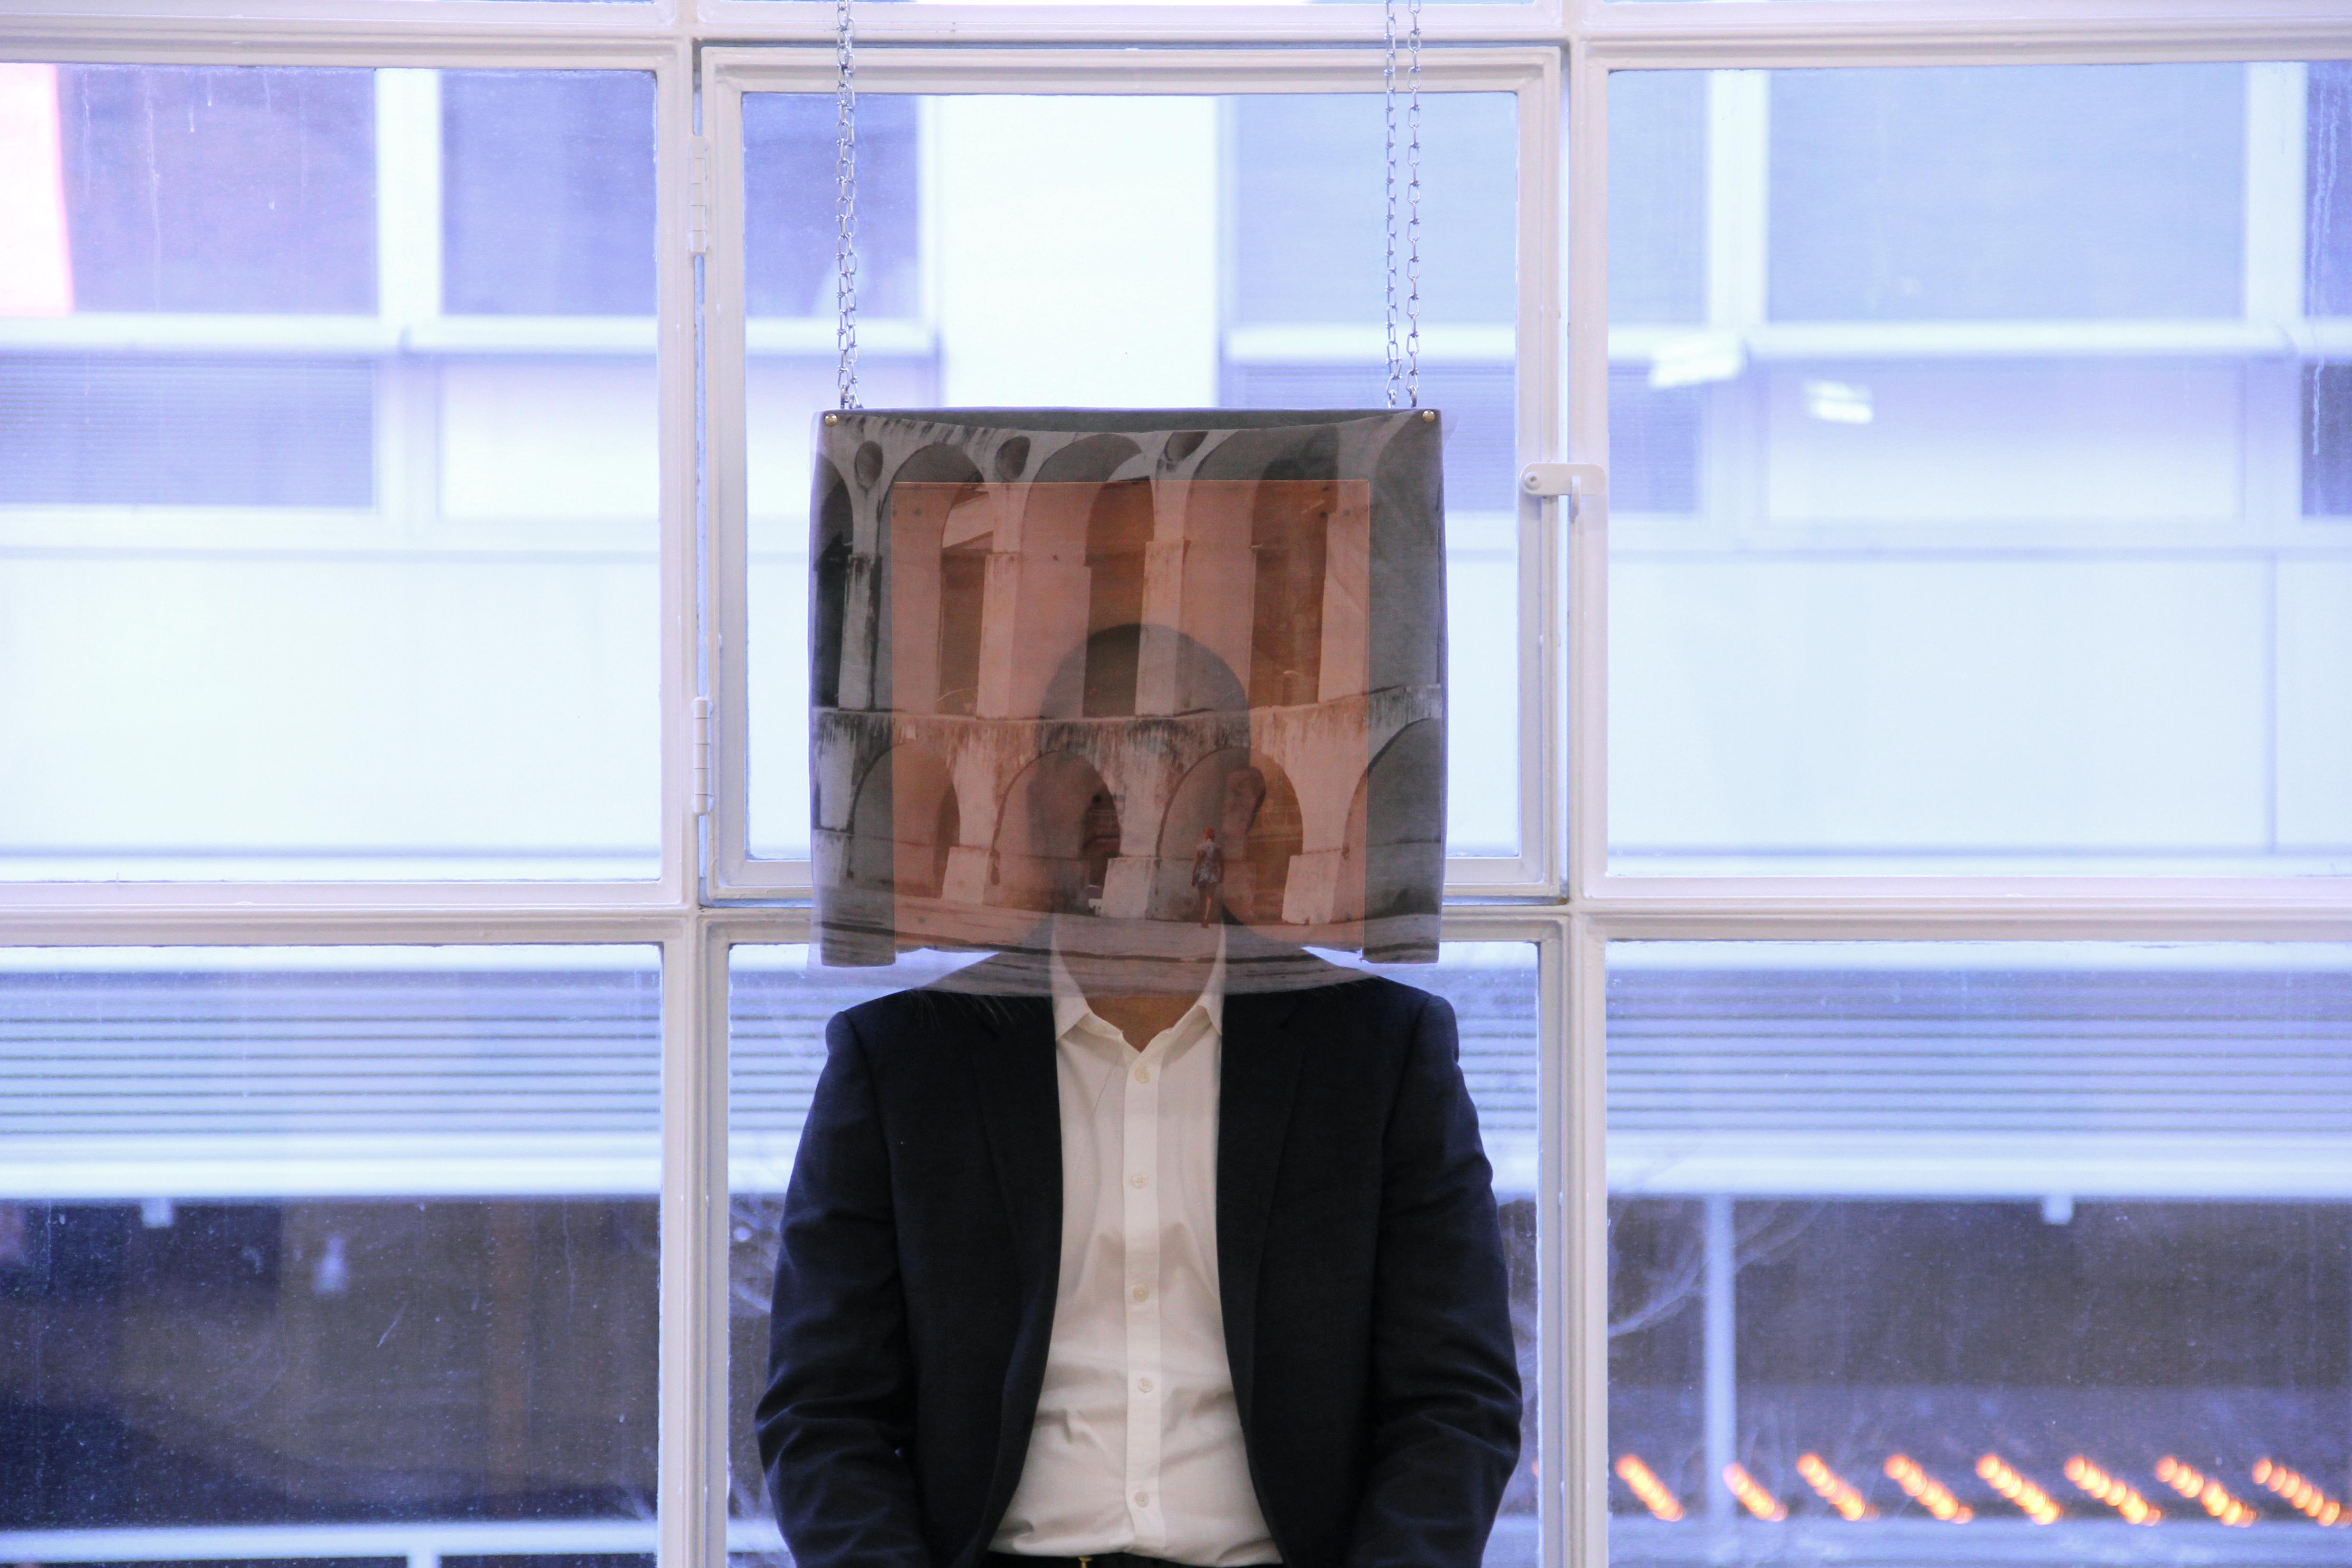 Sergei Tcherepnin, Ear Tone Box (Pied Piper Recedes), 2013, microsuede, wood, copper, silk, transducers, amplifier, iPod, 16 x 18 x 16 inches